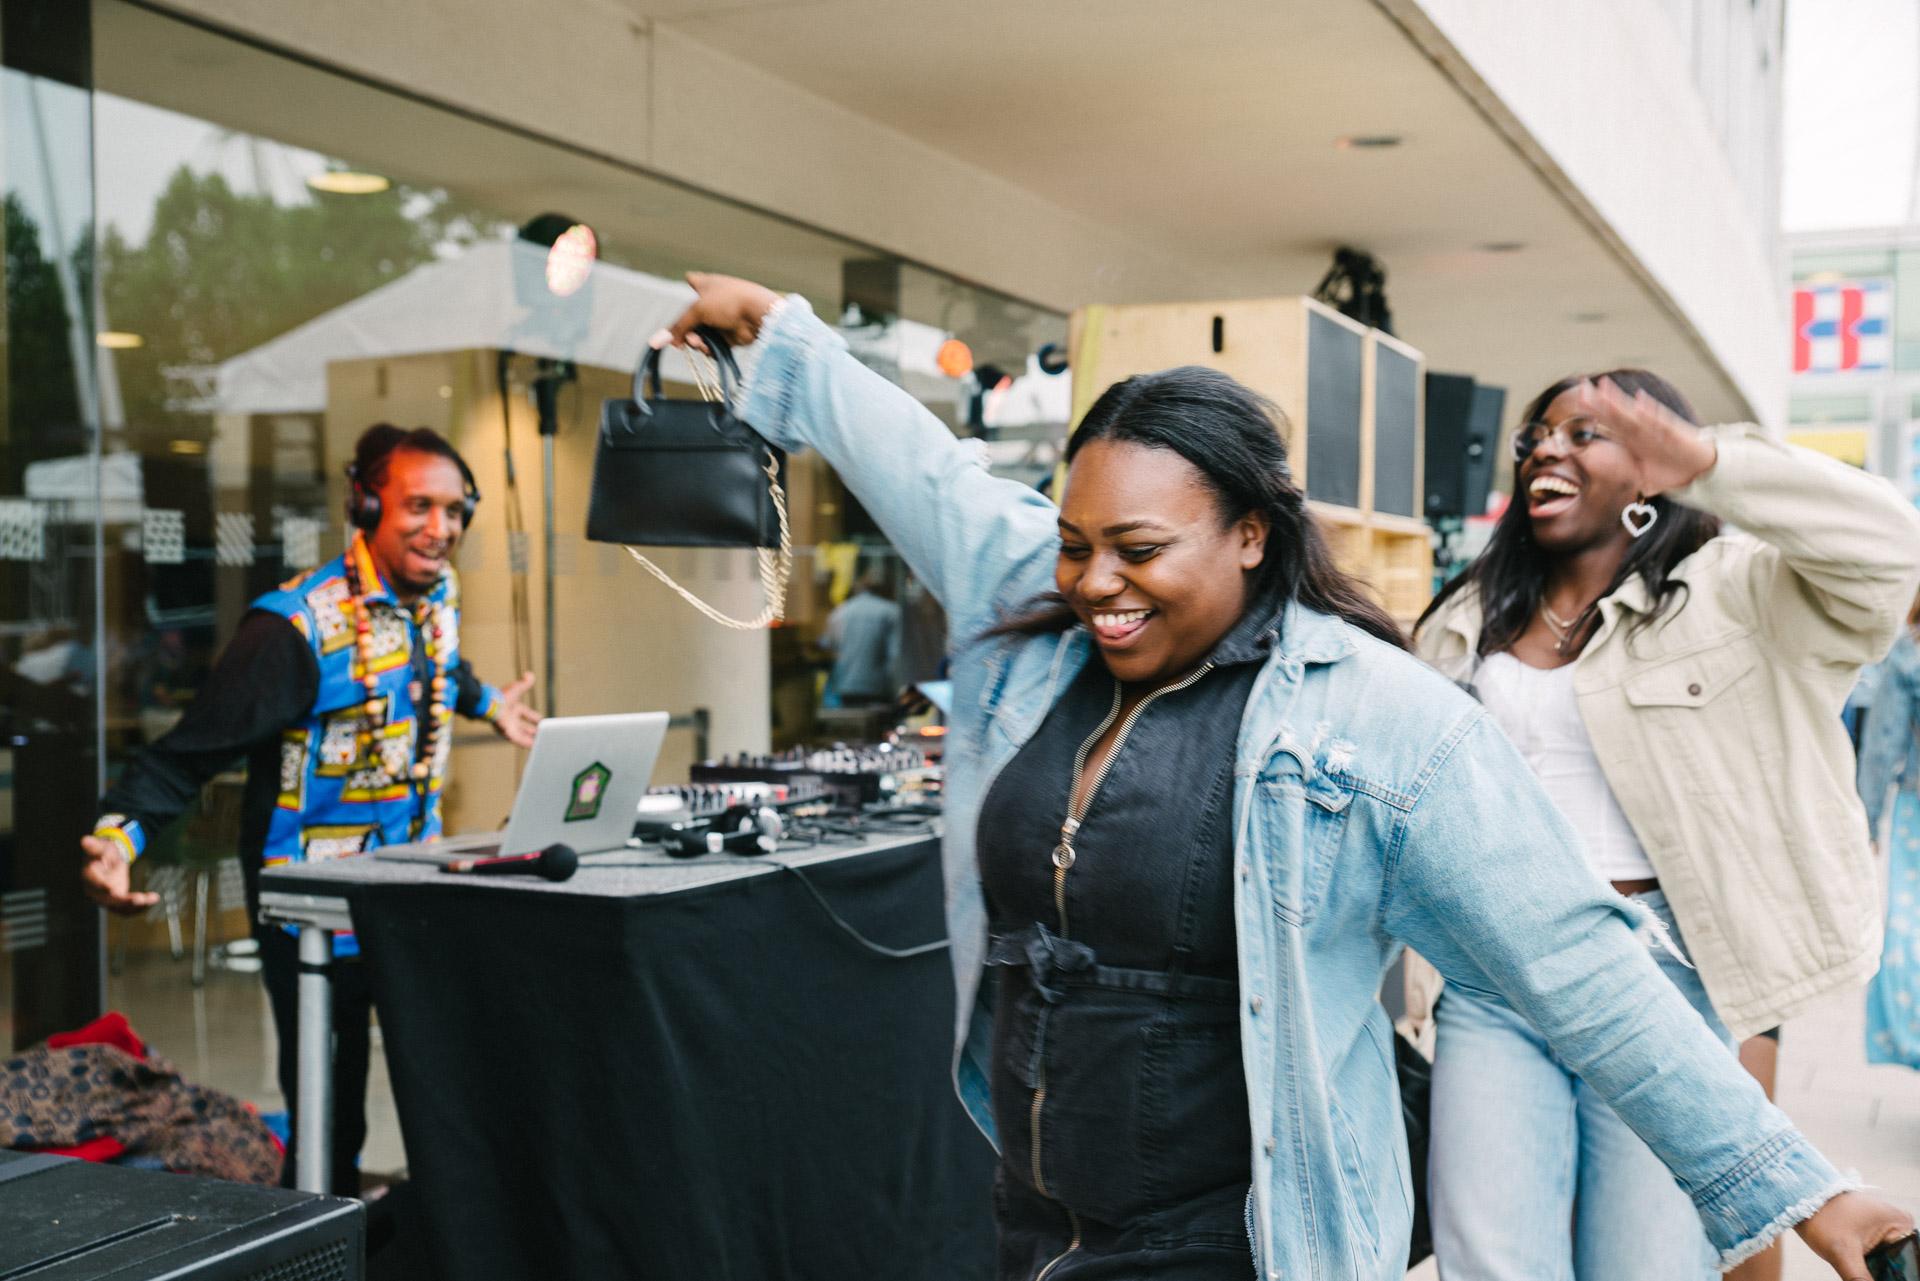 women walk past a DJ smiling and dancing